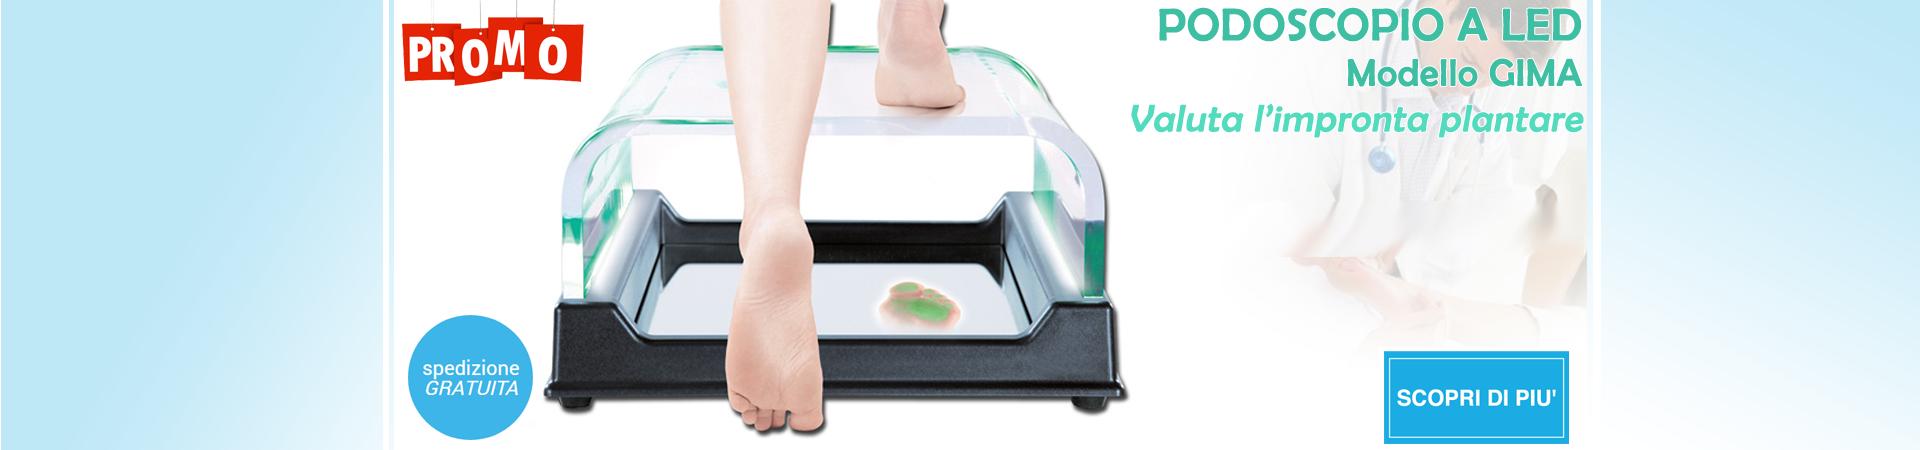 Podoscopio plantoscopio a Led Gima Ortopedia | Elettromedicali | Forniture Ospedaliere | Medisanshop.com